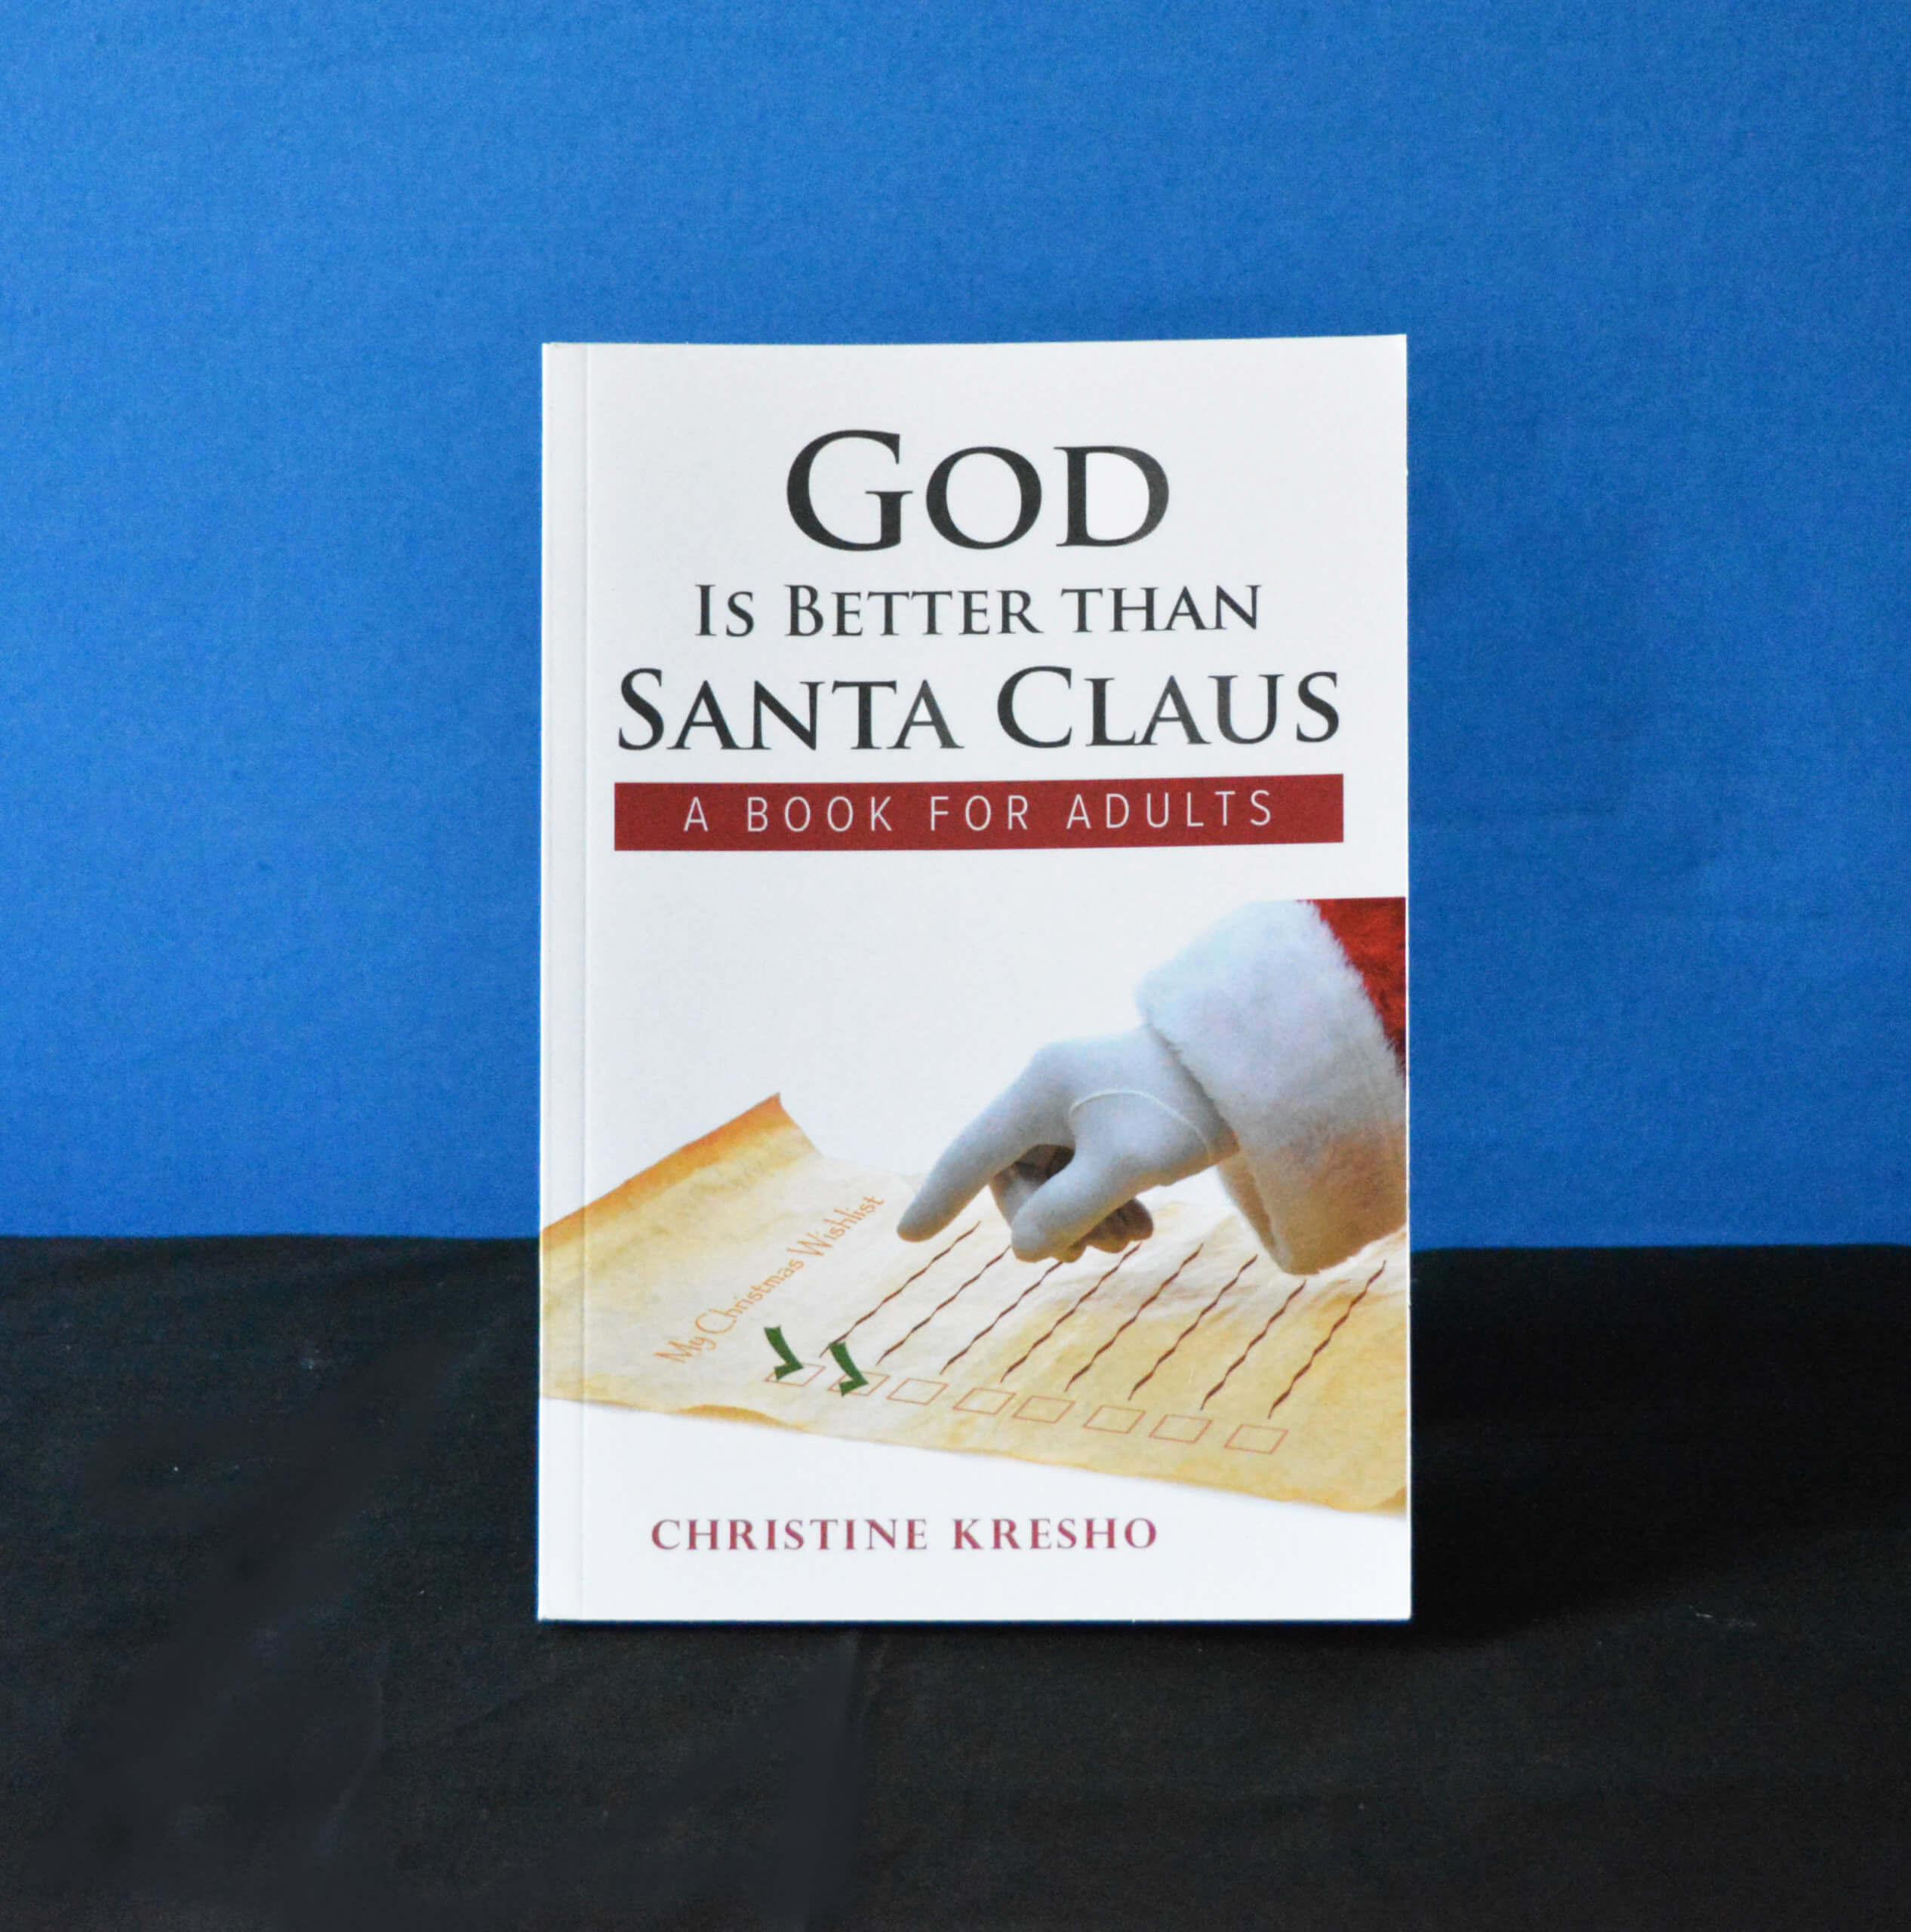 Book - God is better than Santa Claus